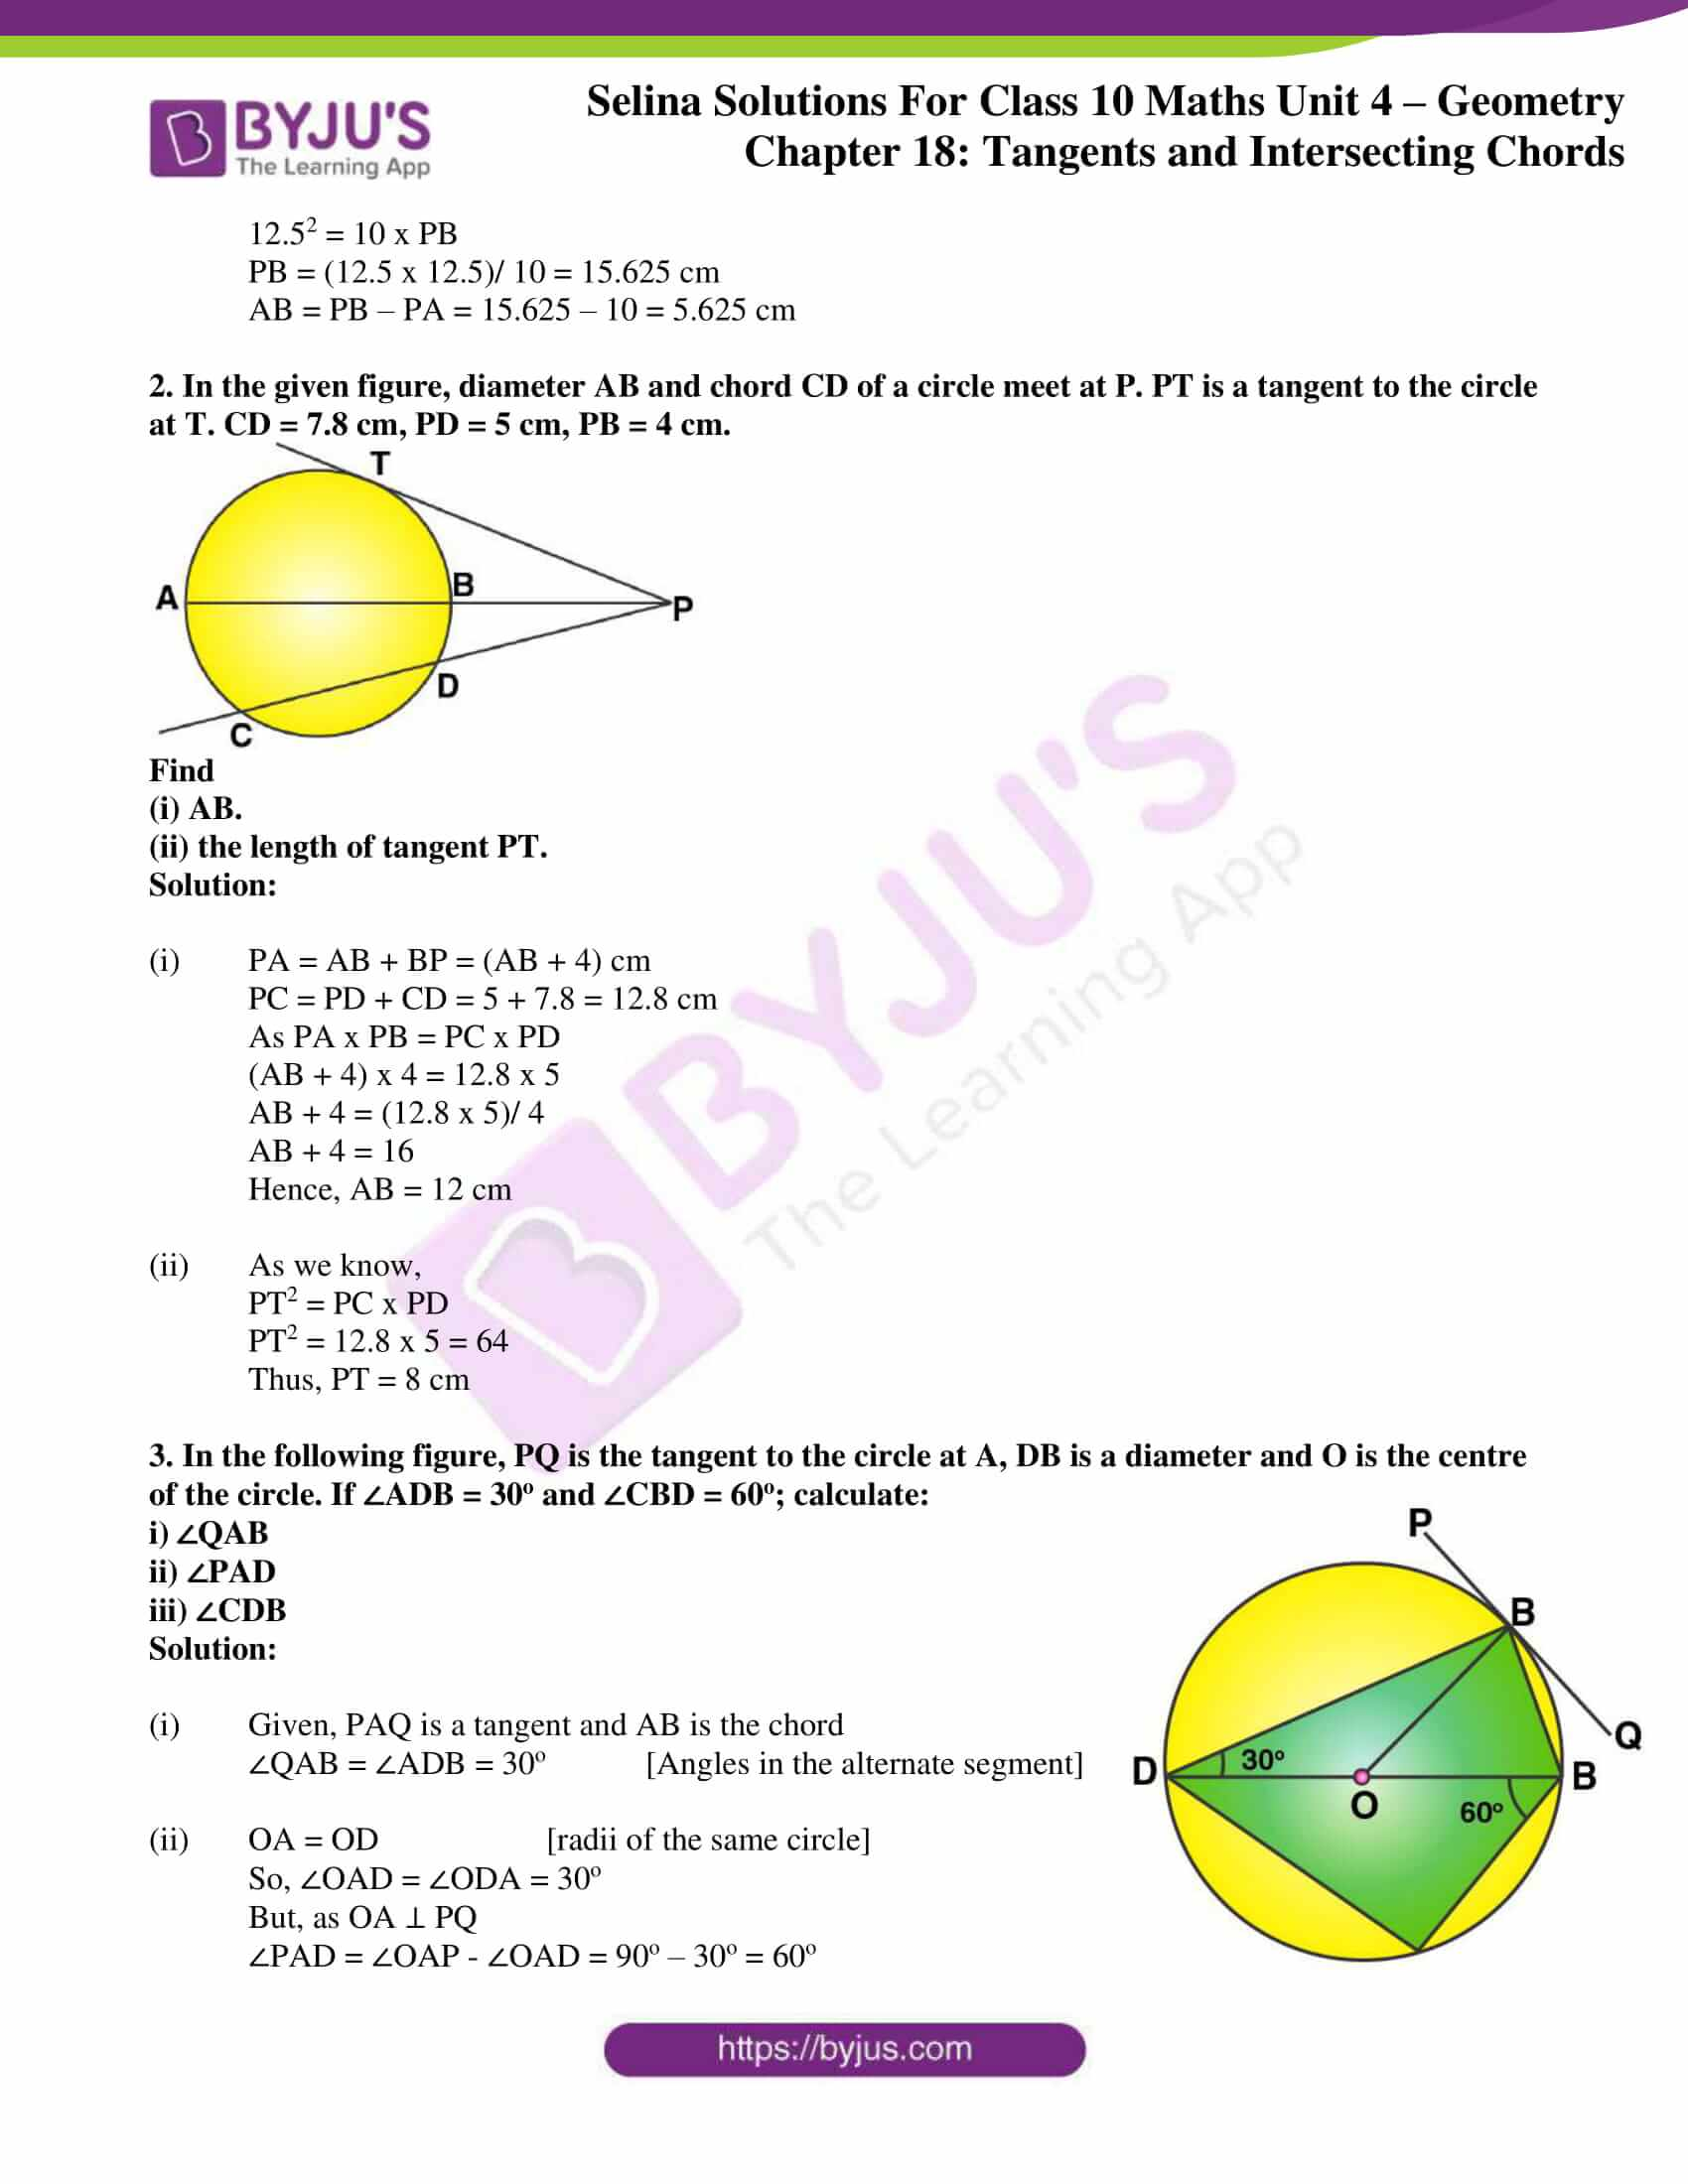 selina-sol-maths-class-10-ch-18-ex-b-2